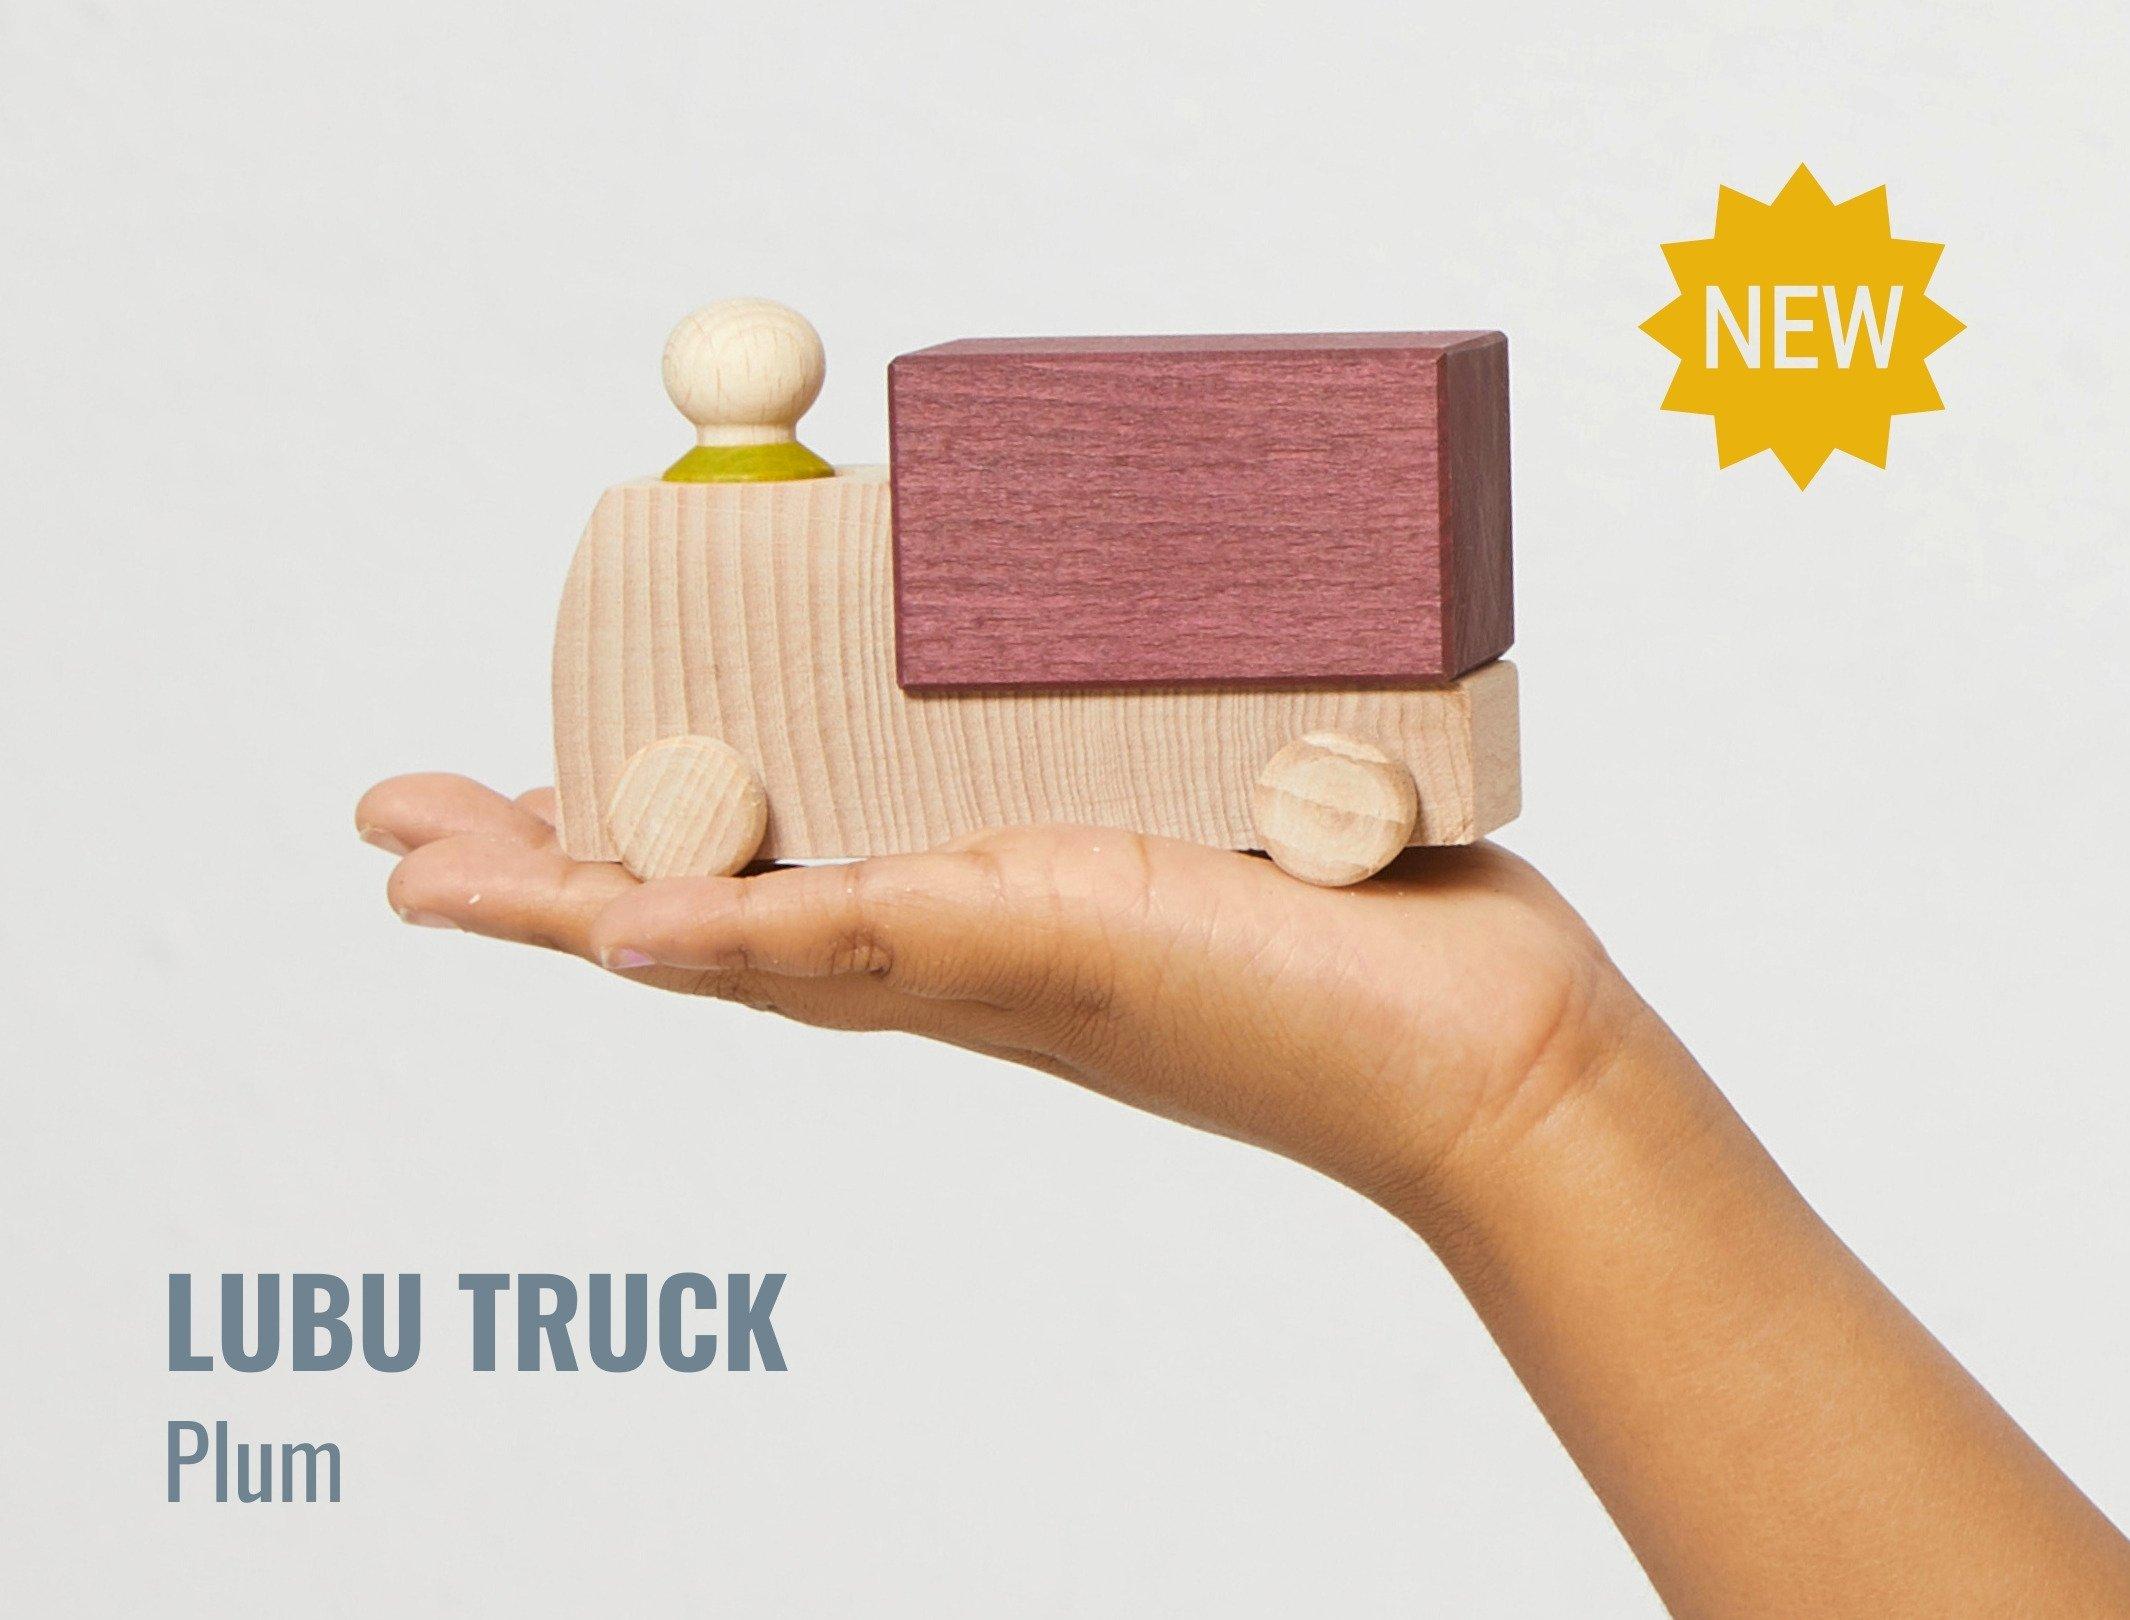 Lubulona Plum wooden truck